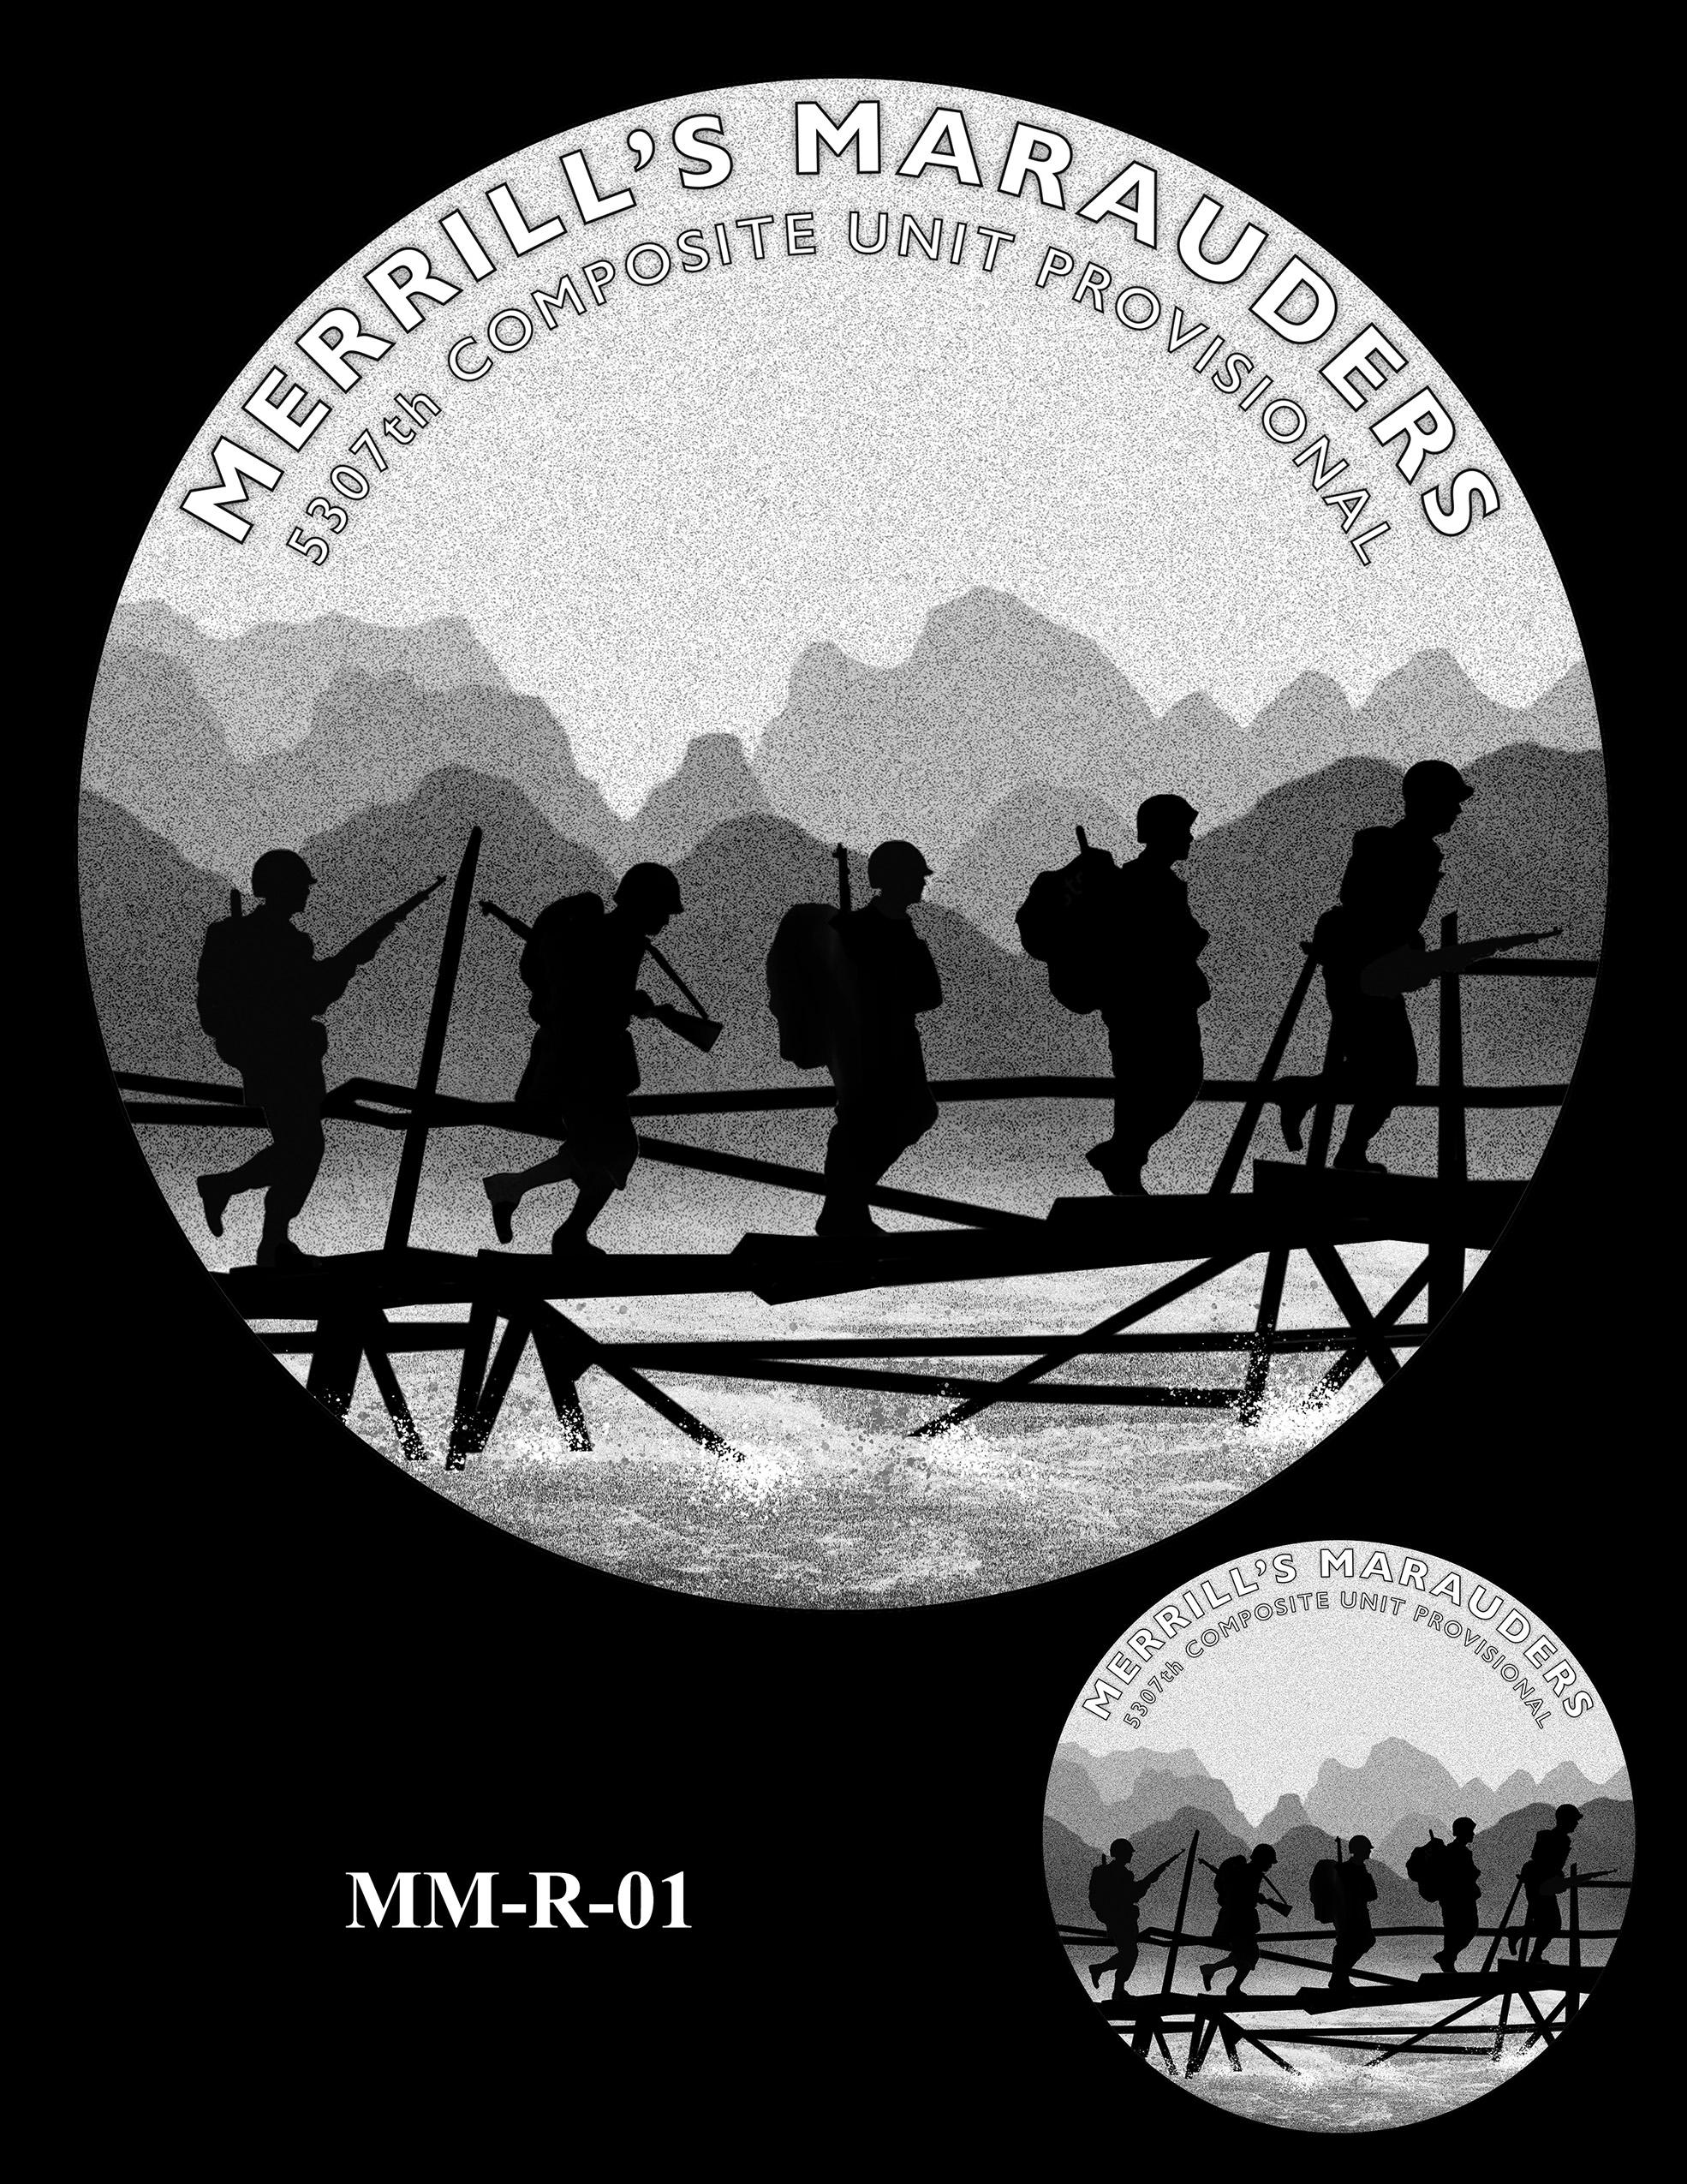 MM-R-01 -- Merrill's Marauders Congressional Gold Medal